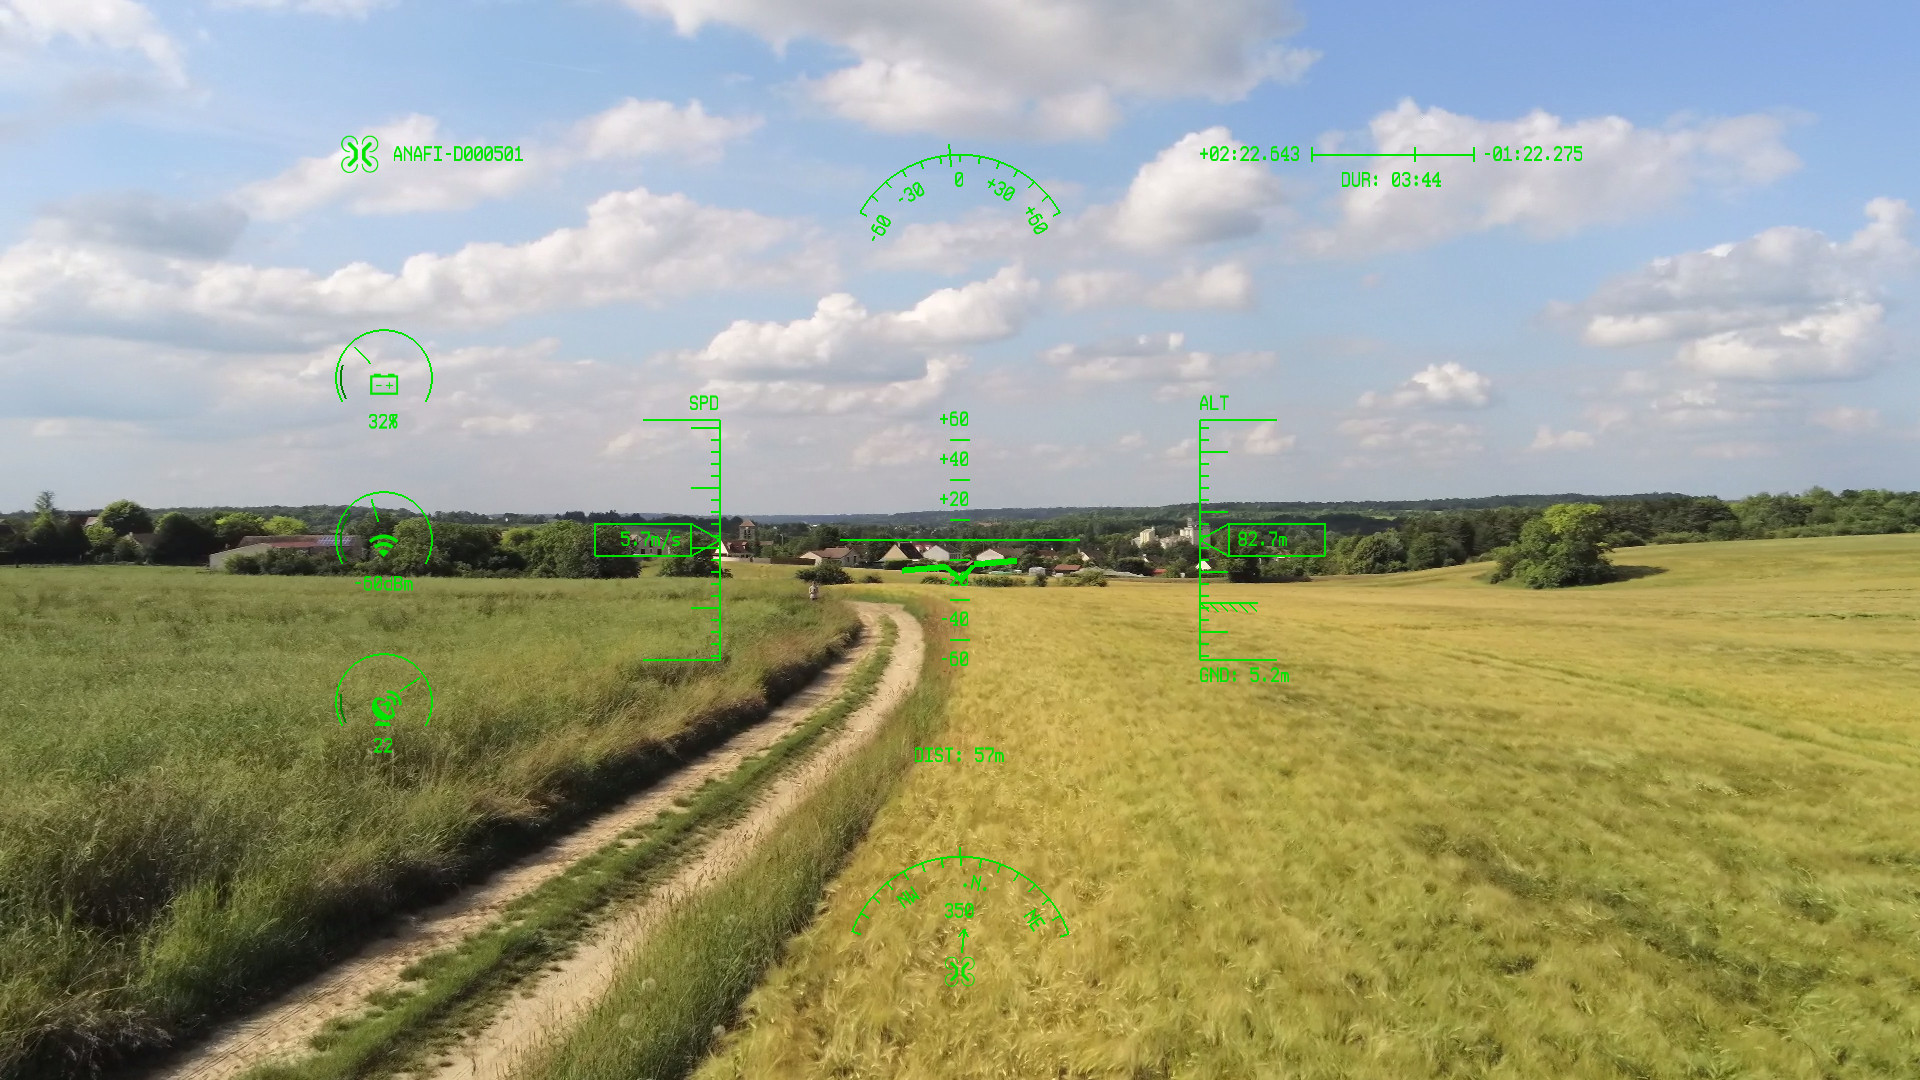 Embedded Video Metadata — PDrAW 1 0 1 documentation